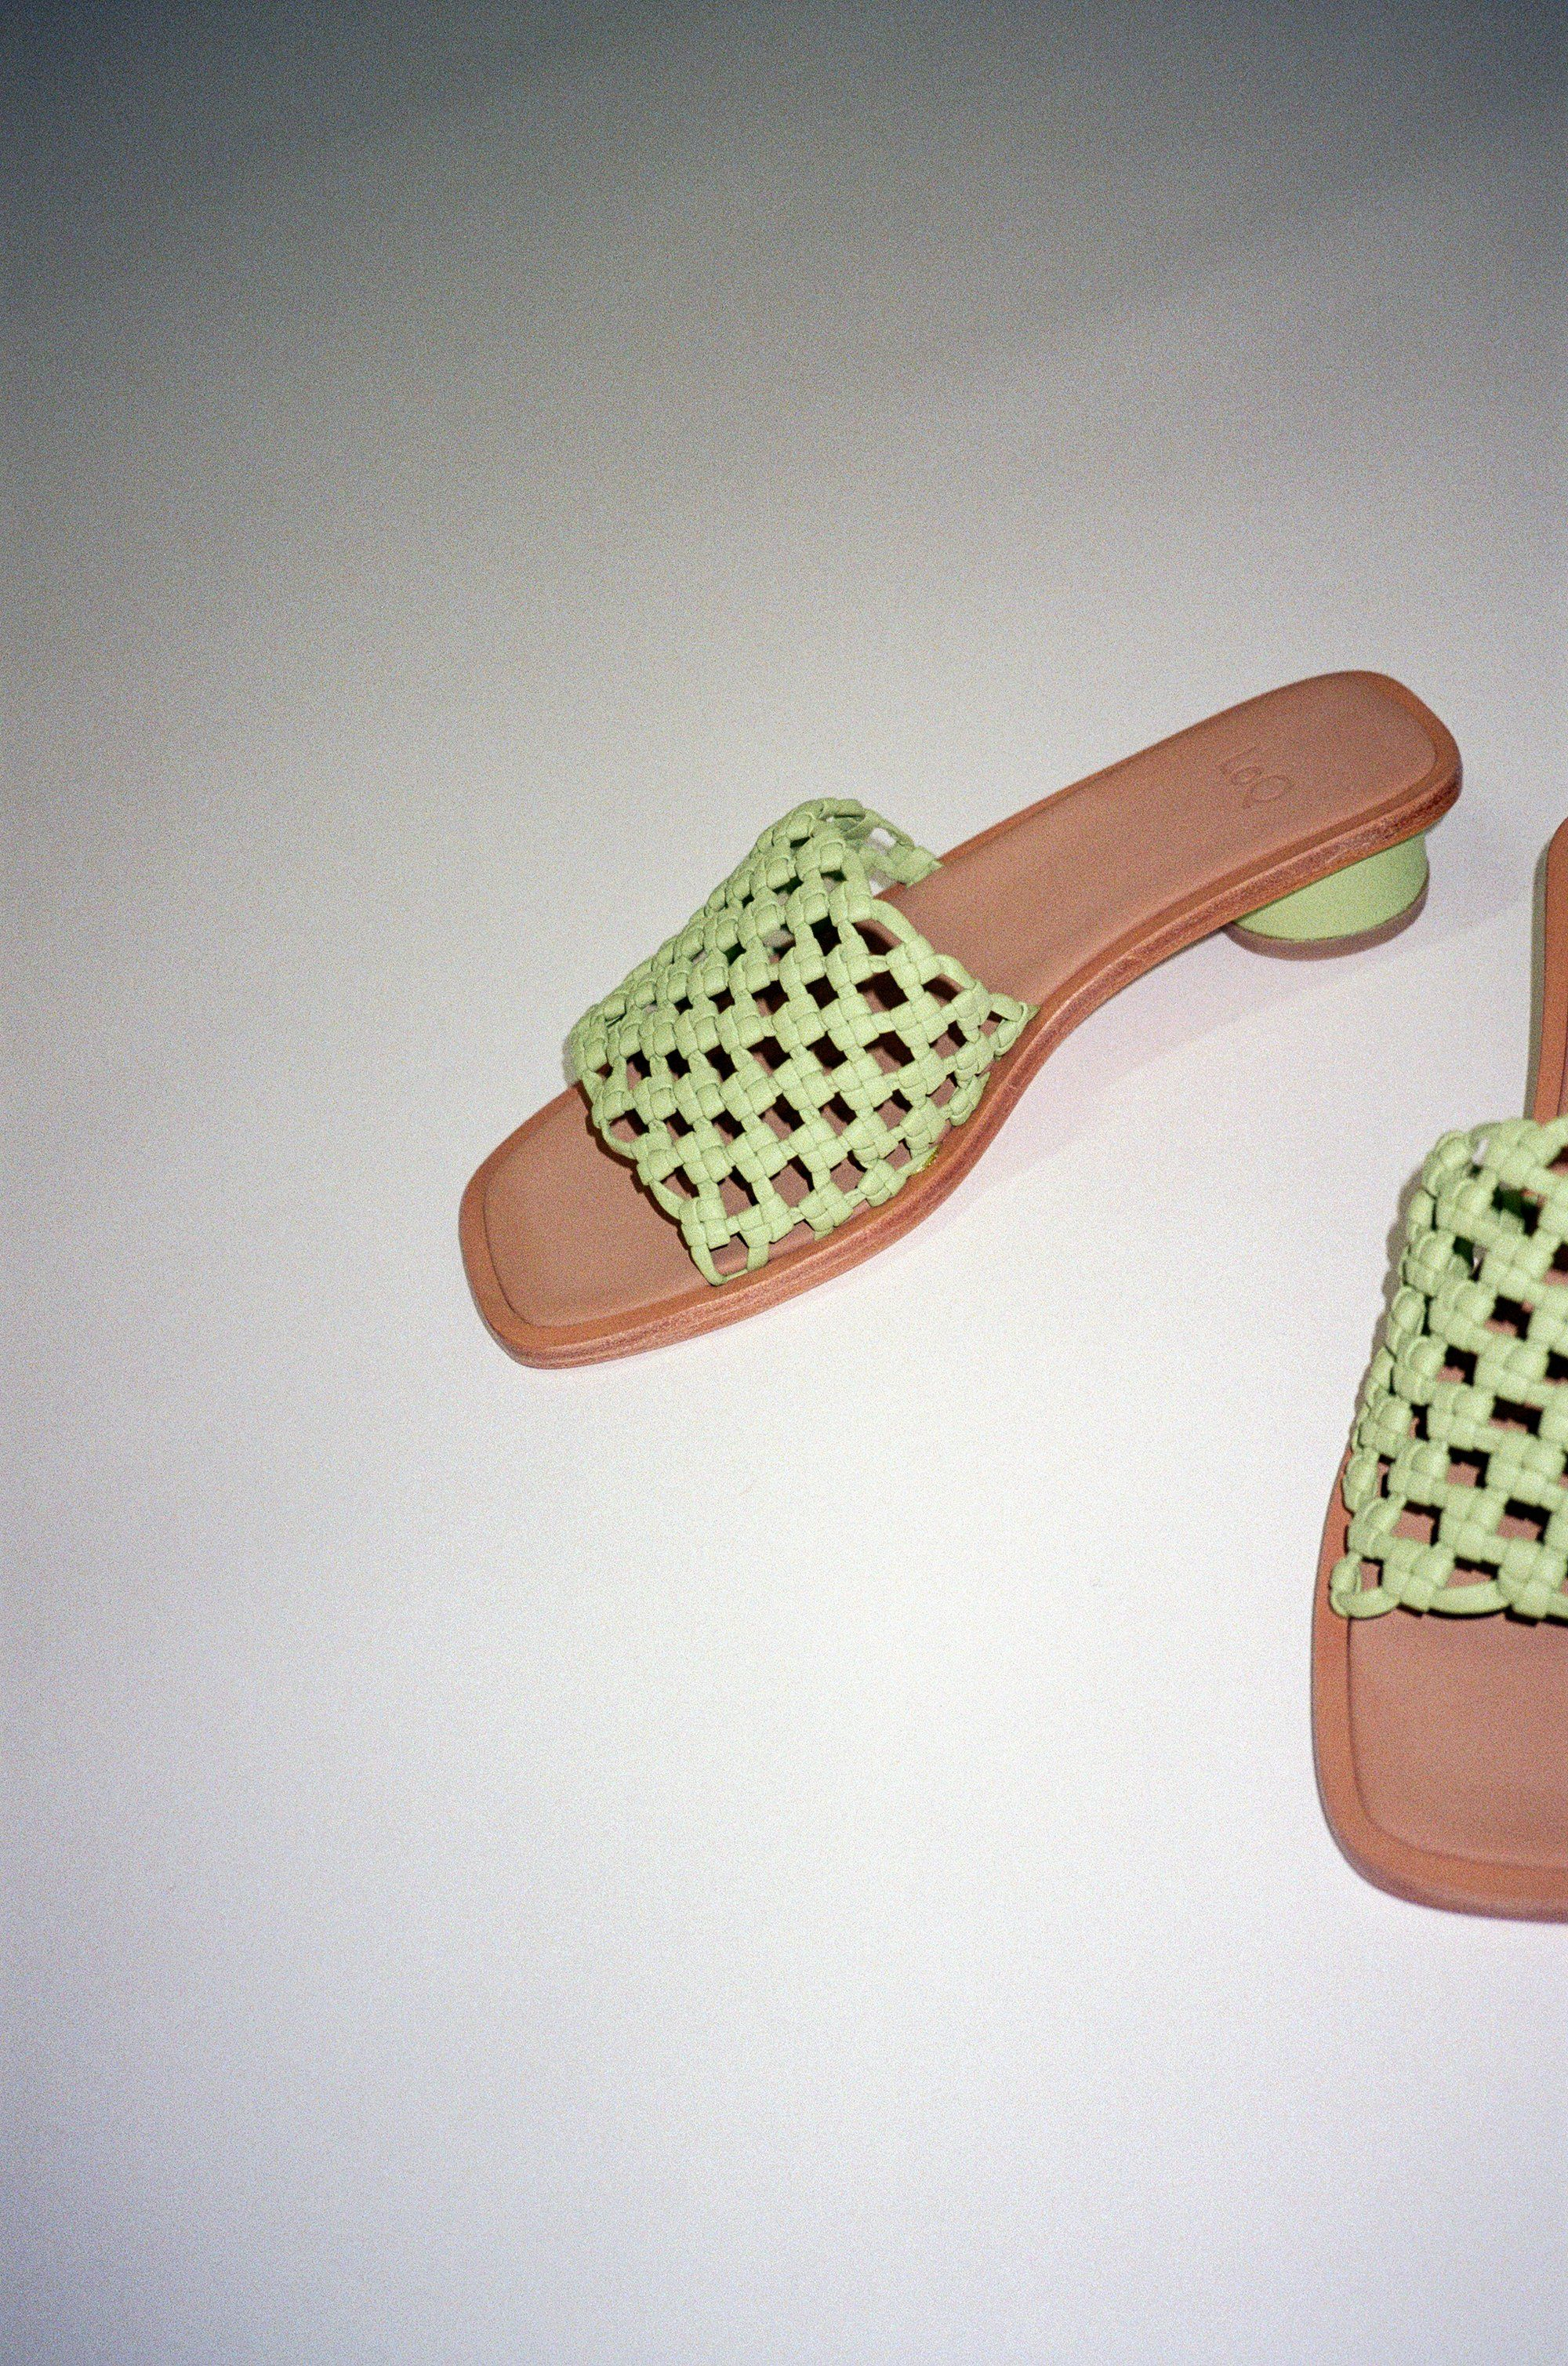 Simona Sandal Pomelo | Black leather shoes, Sandals